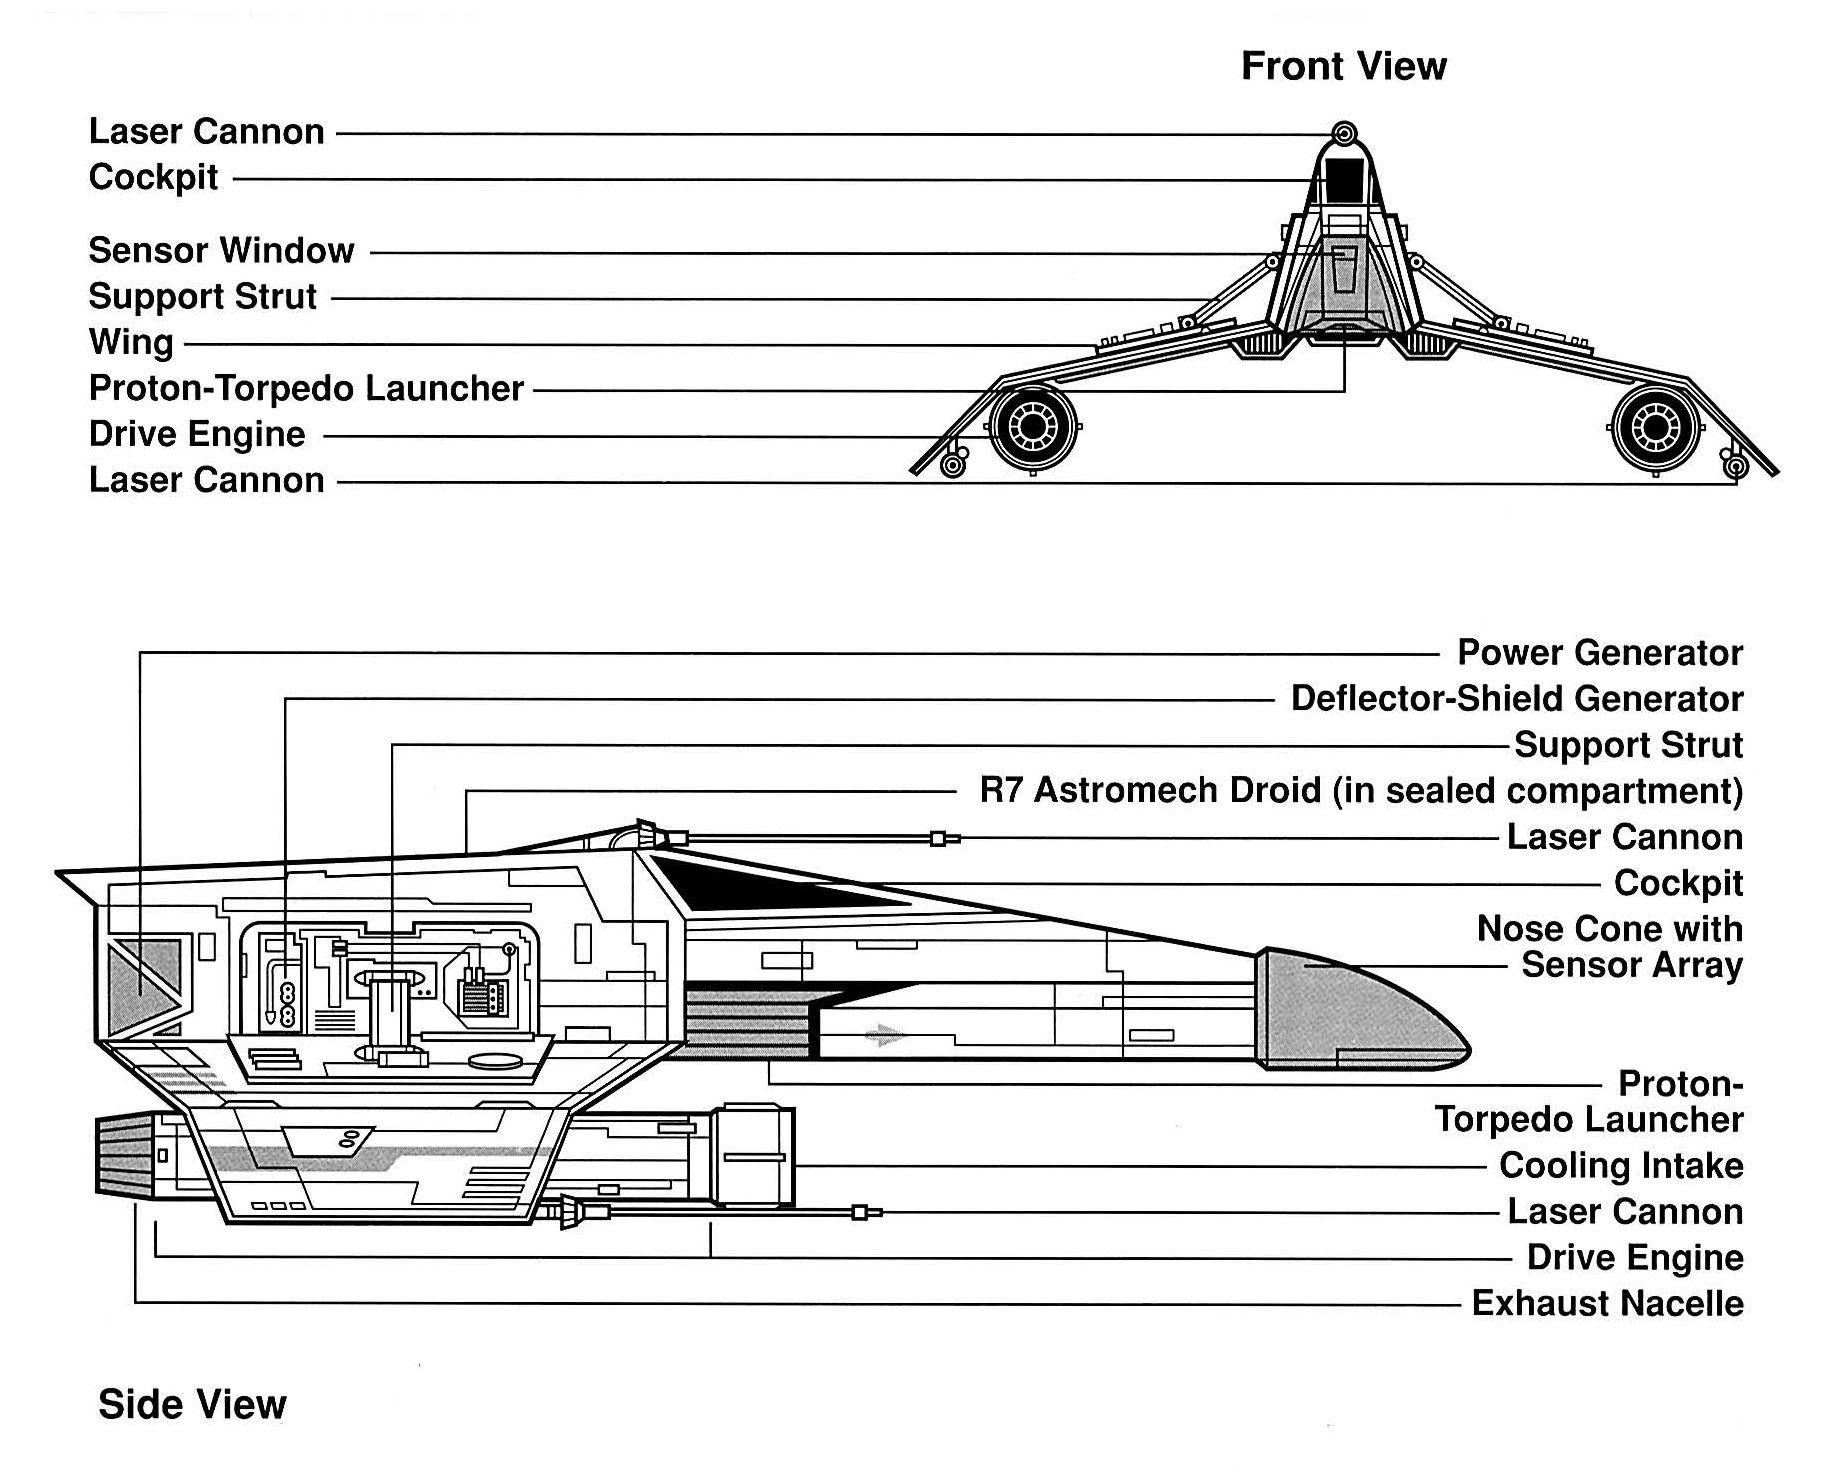 E wing escort starfighter blueprint blueprints pinterest e wing escort starfighter blueprint malvernweather Gallery